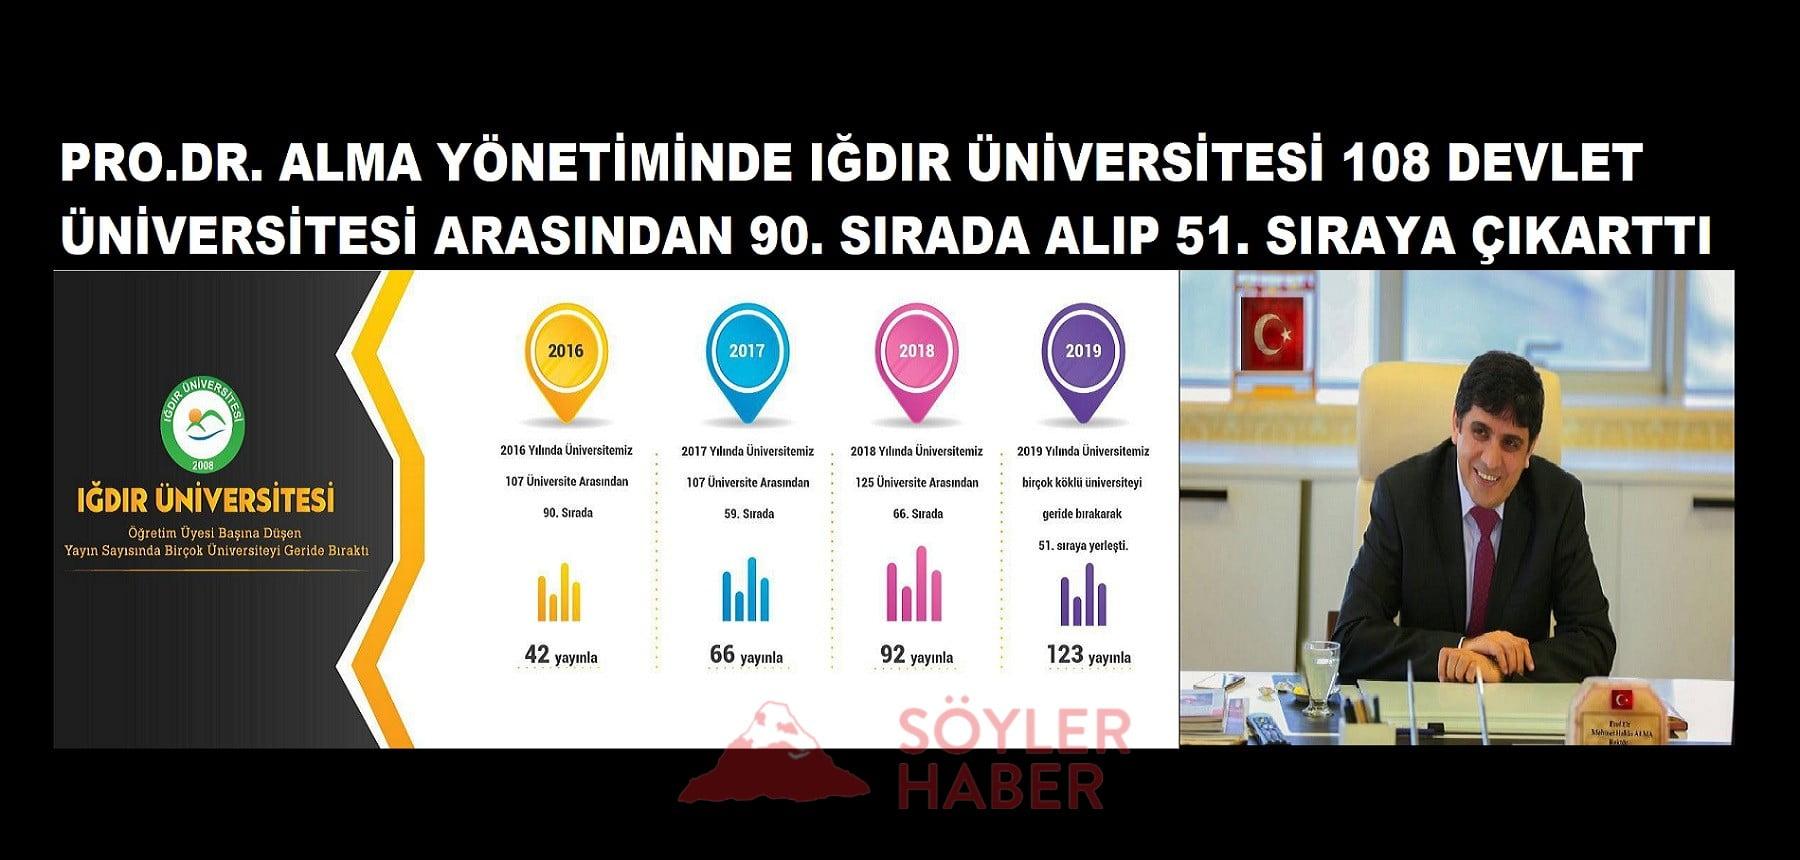 PROF. DR. ALMA, IĞDIR ÜNİVERSİTESİNİ 51. SIRAYA ÇIKARTTI